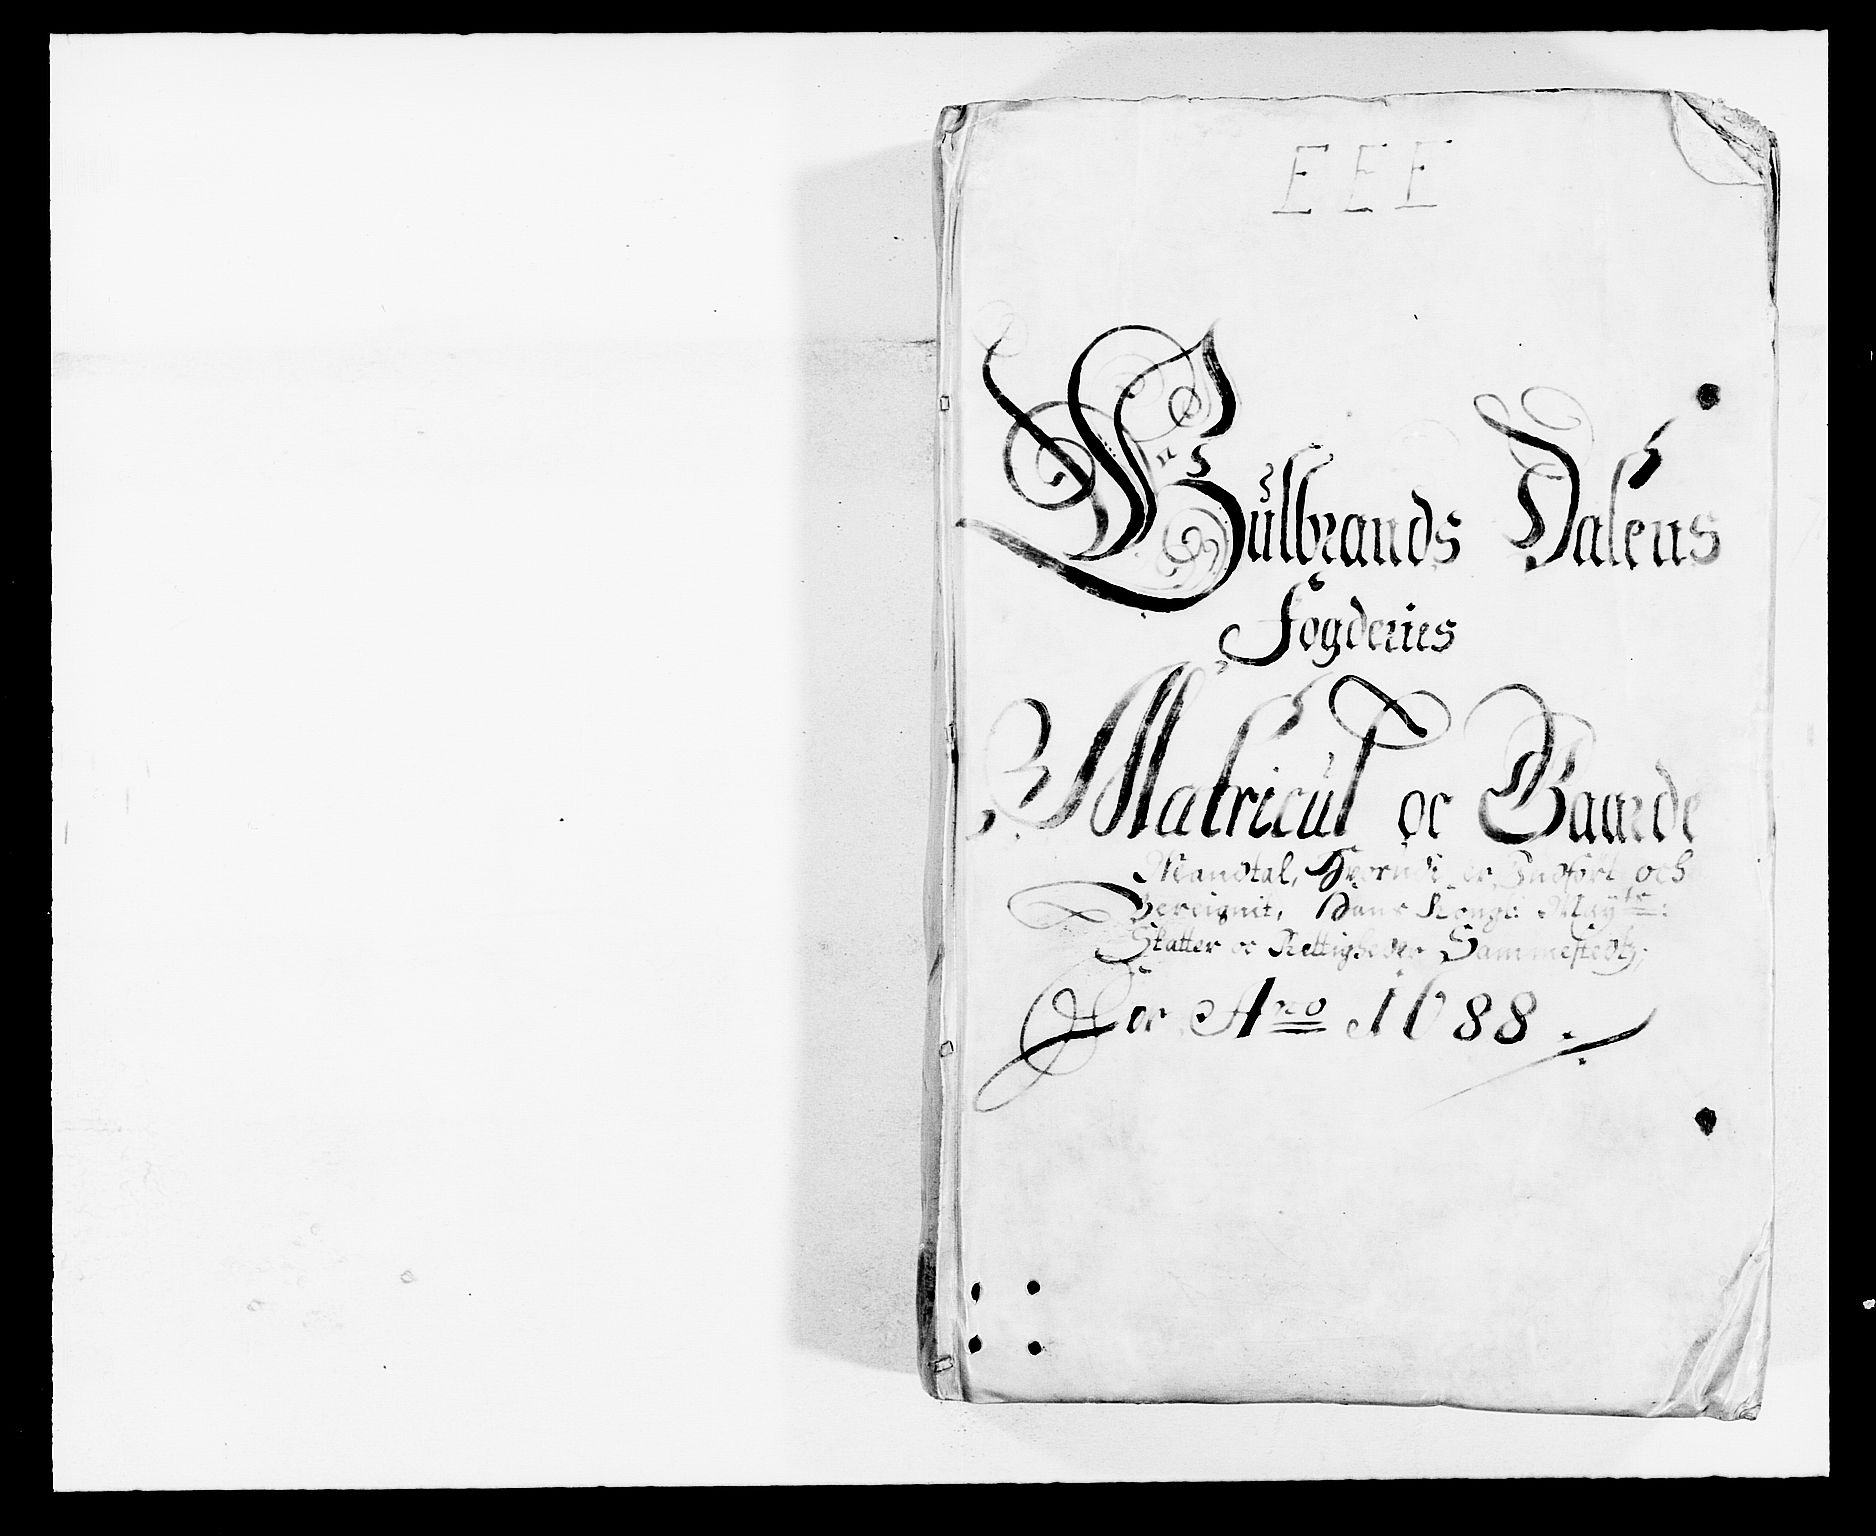 RA, Rentekammeret inntil 1814, Reviderte regnskaper, Fogderegnskap, R17/L1163: Fogderegnskap Gudbrandsdal, 1682-1689, s. 78